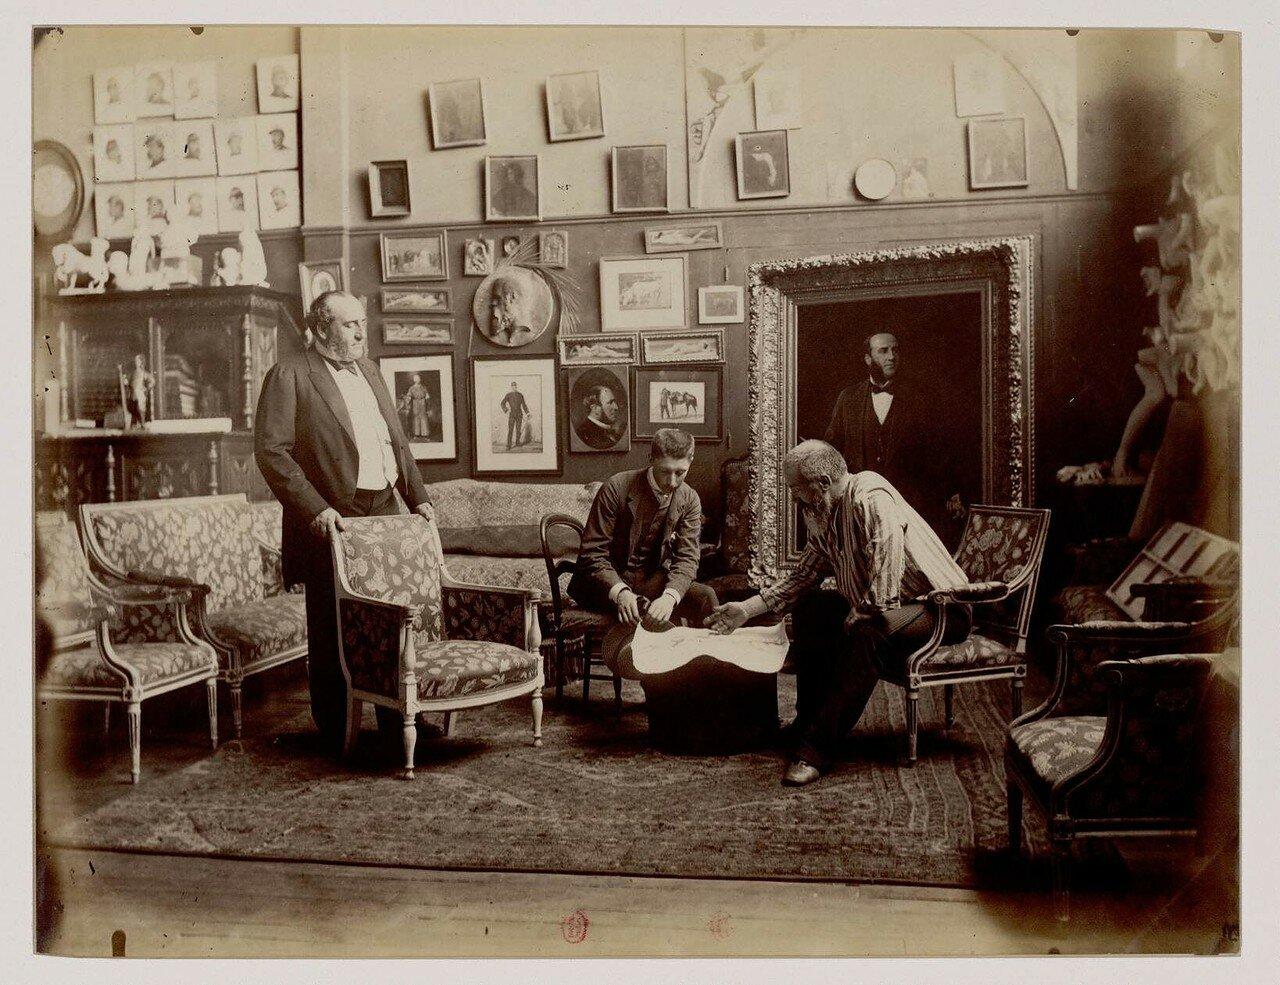 Адольф Ивон (1817-1893) — французский художник баталист